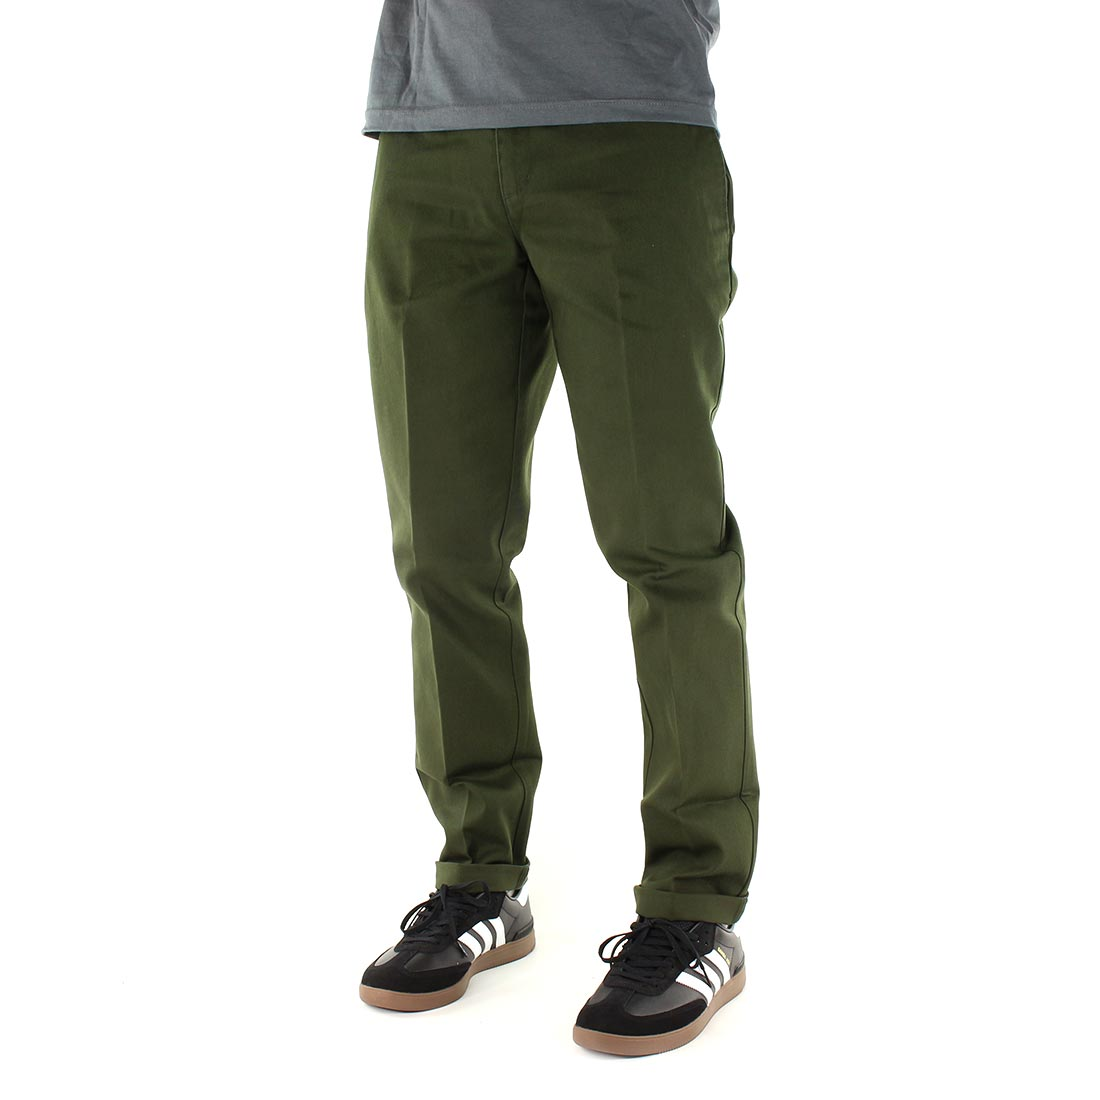 644cca79 Dickies 872 Slim Fit Work Pant – Olive Green